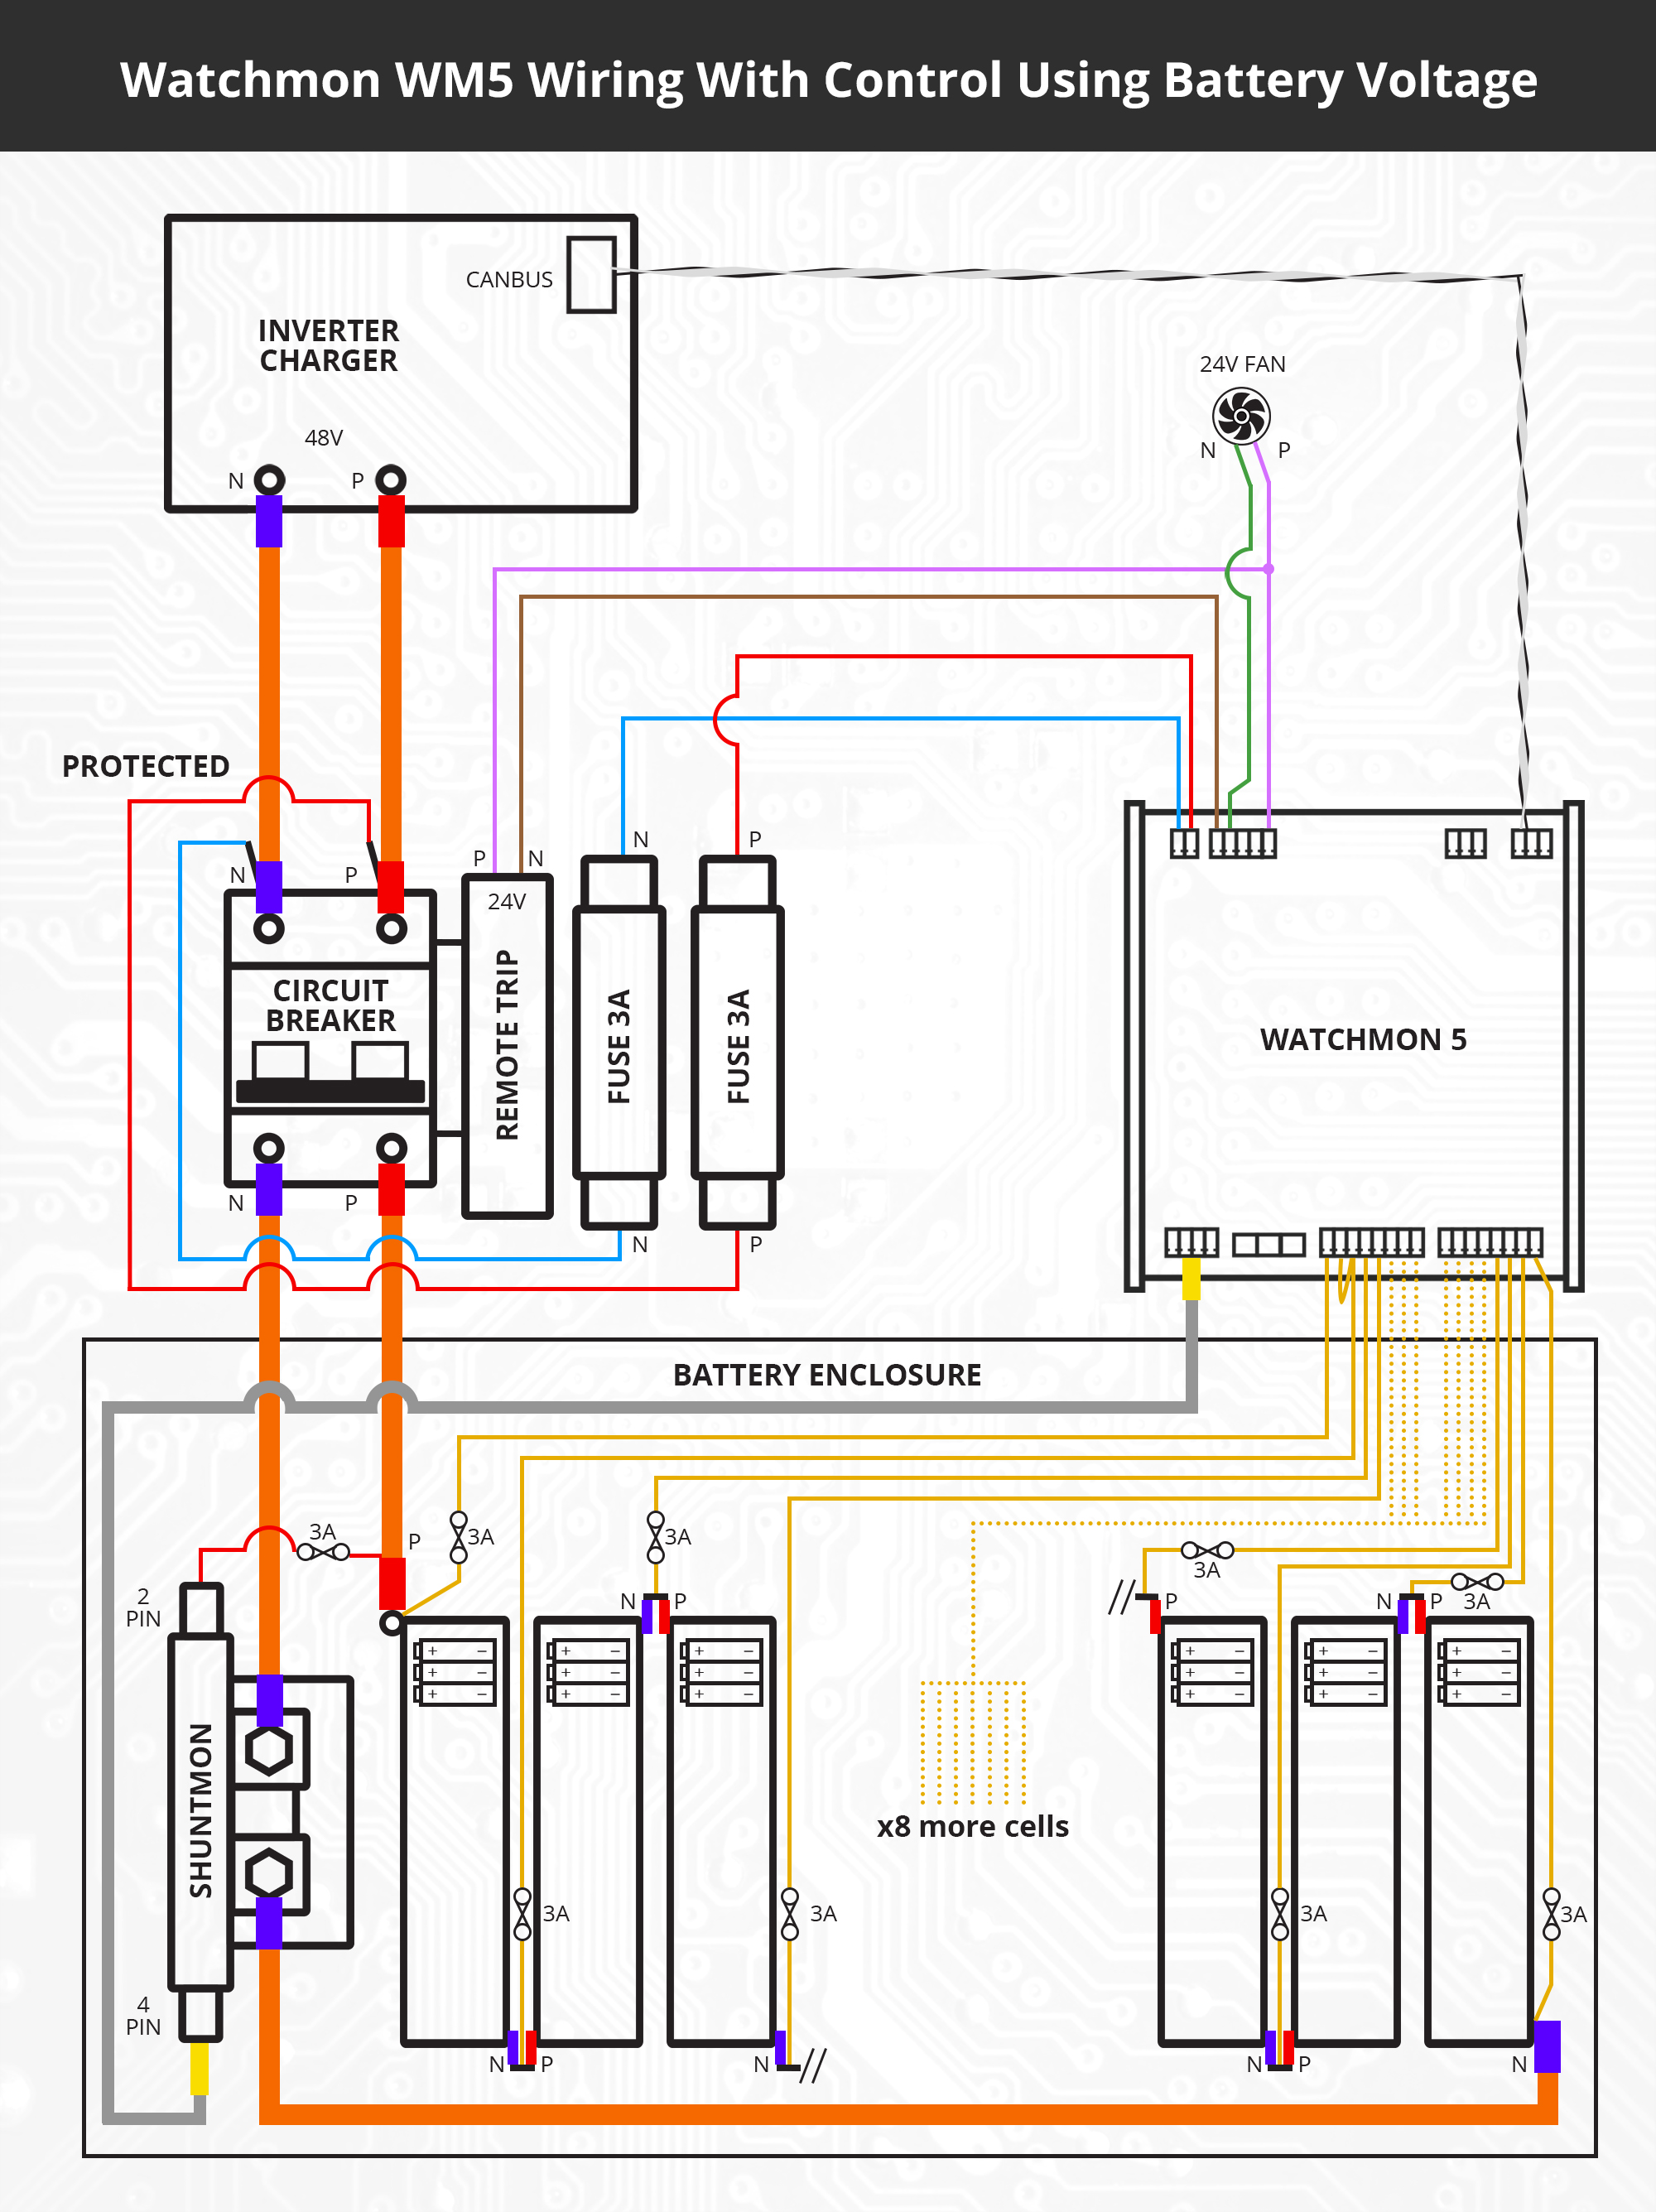 Typical Wiring Diagrams Watchmonplus Wm5 Batrium Knowledge Base